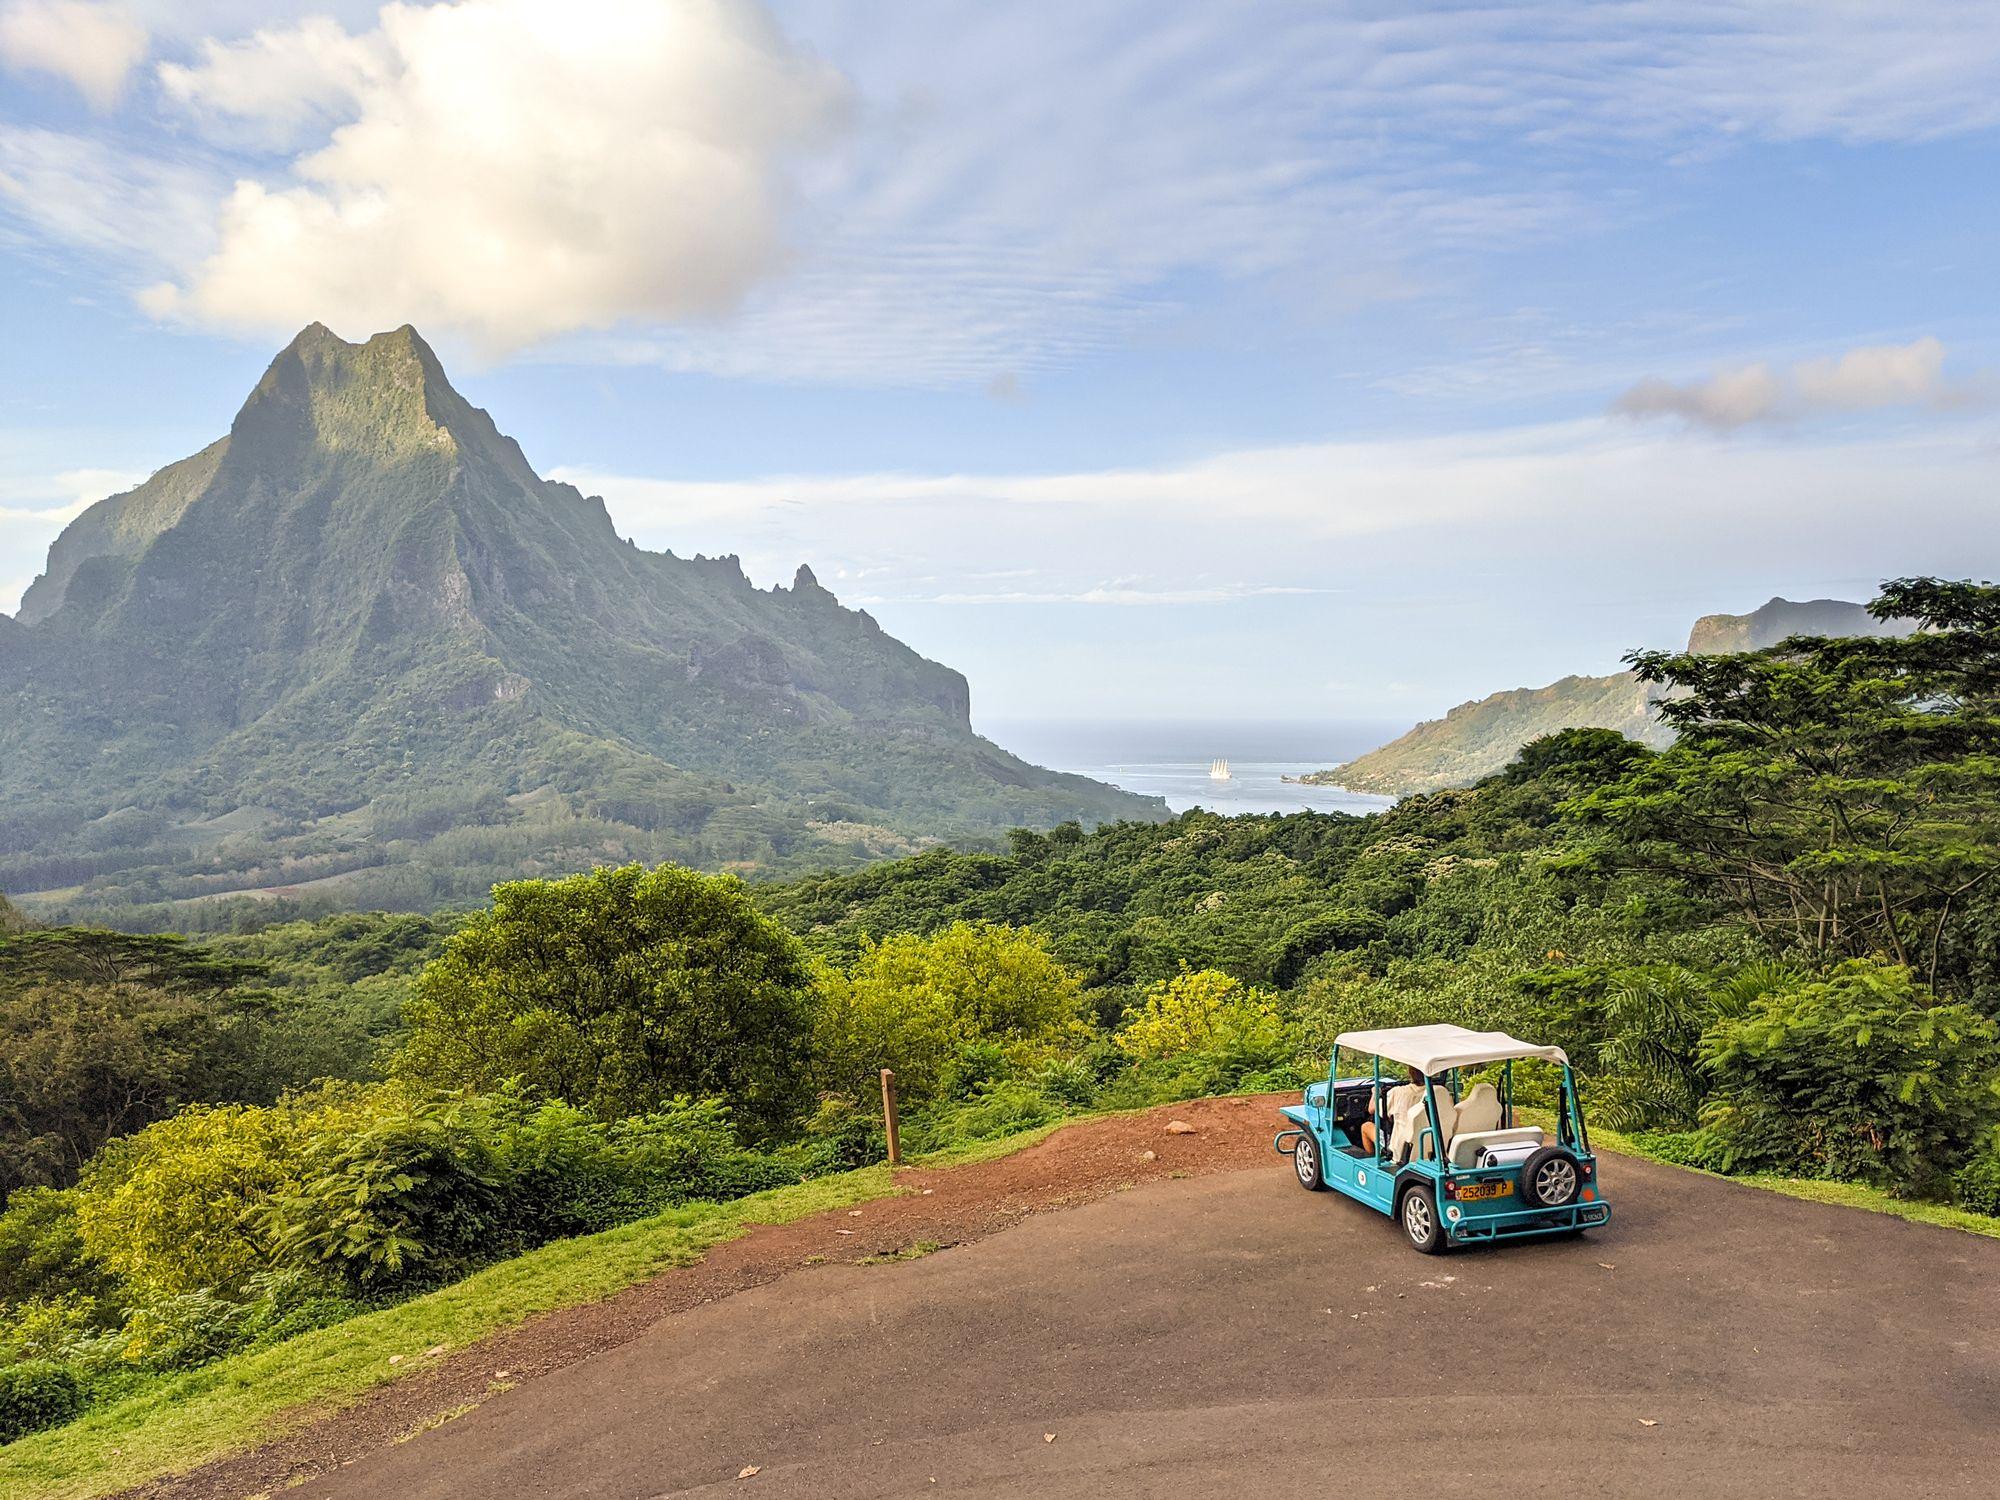 belvedere moorea french polynesia